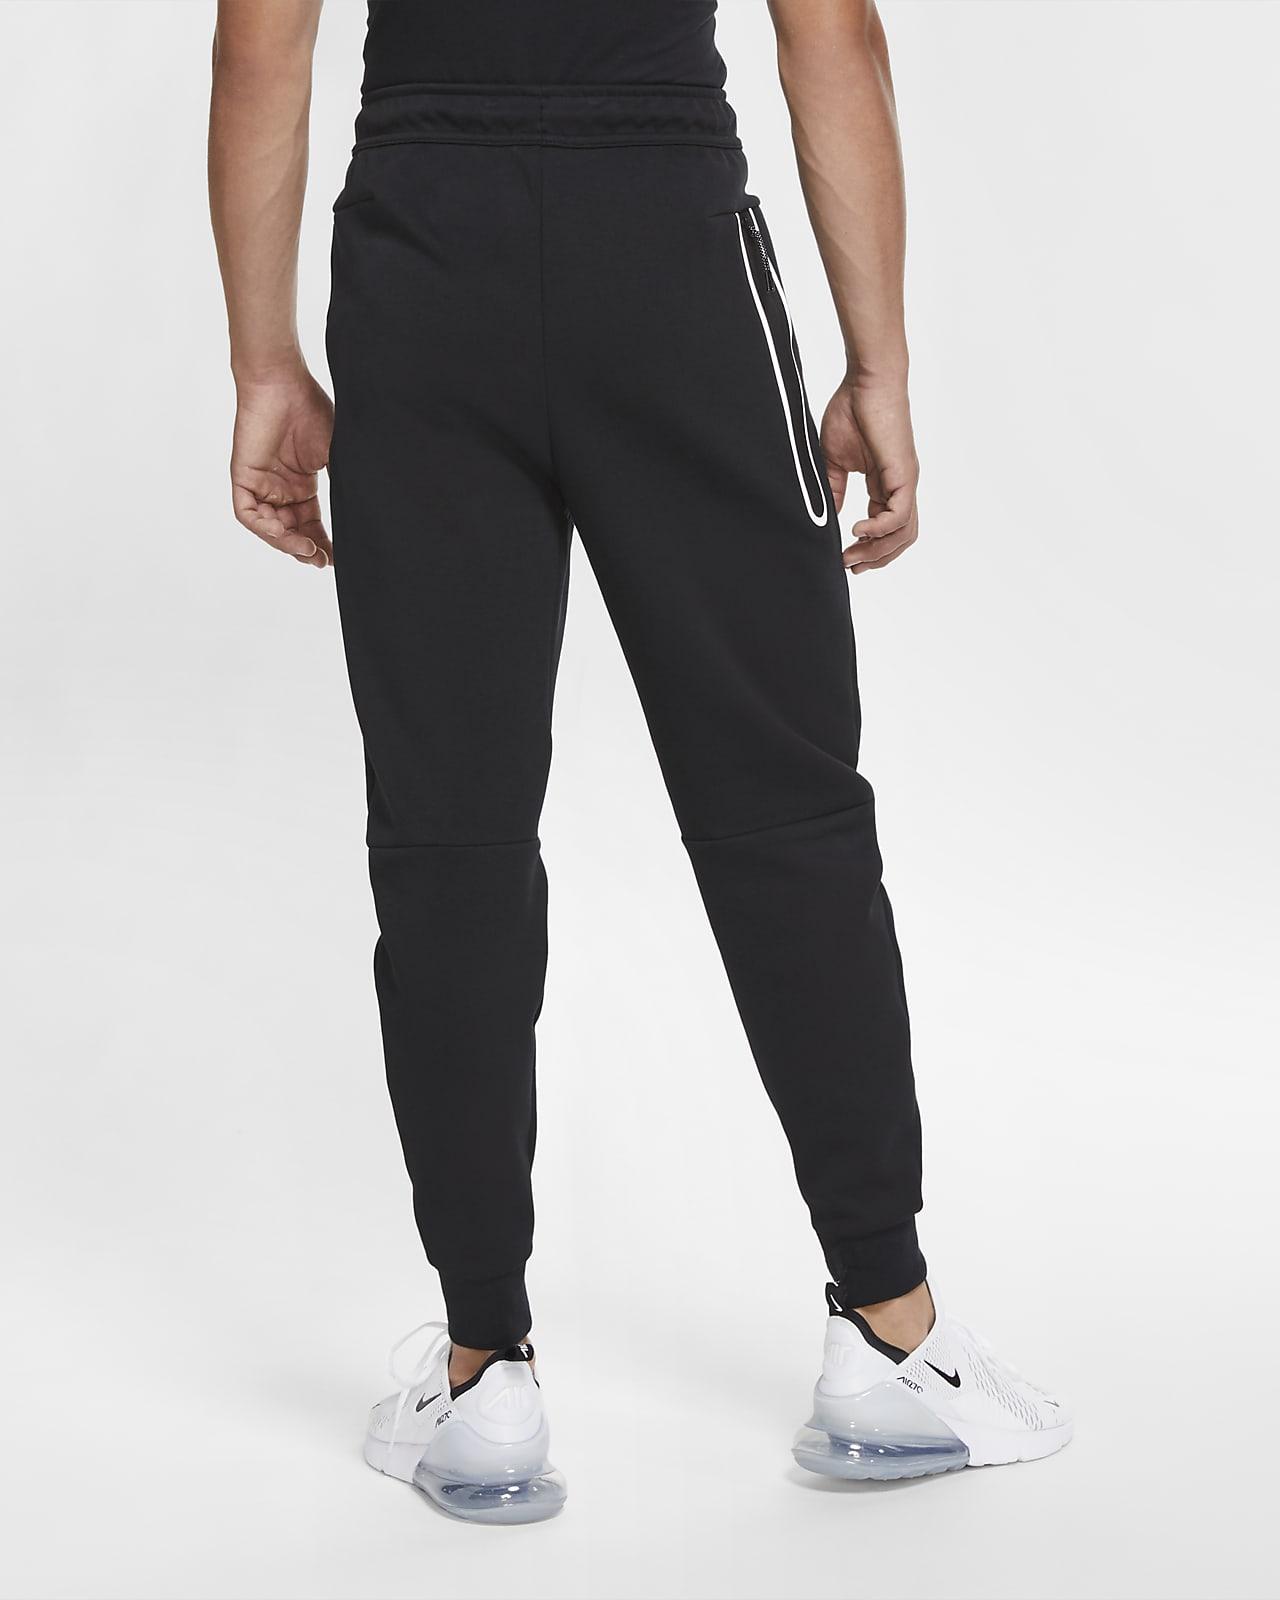 ojo Nathaniel Ward Bombardeo  Pantalones deportivos para hombre Nike Sportswear Tech Fleece. Nike.com